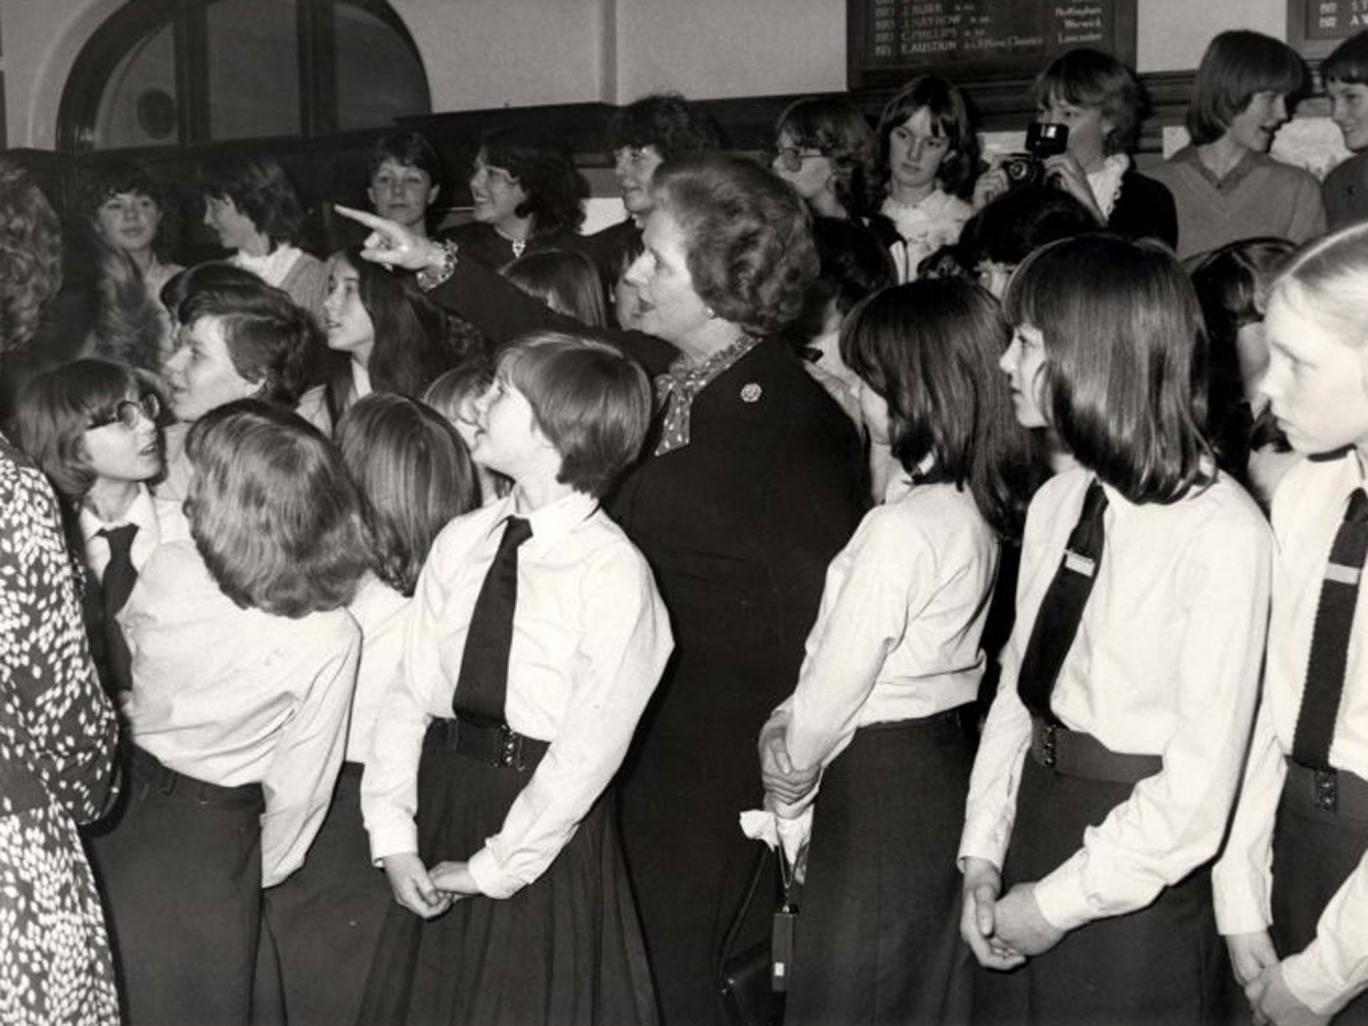 Margaret Thatcher during a visit to her old school, Kesteven and Grantham Girls' Grammar, in 1982